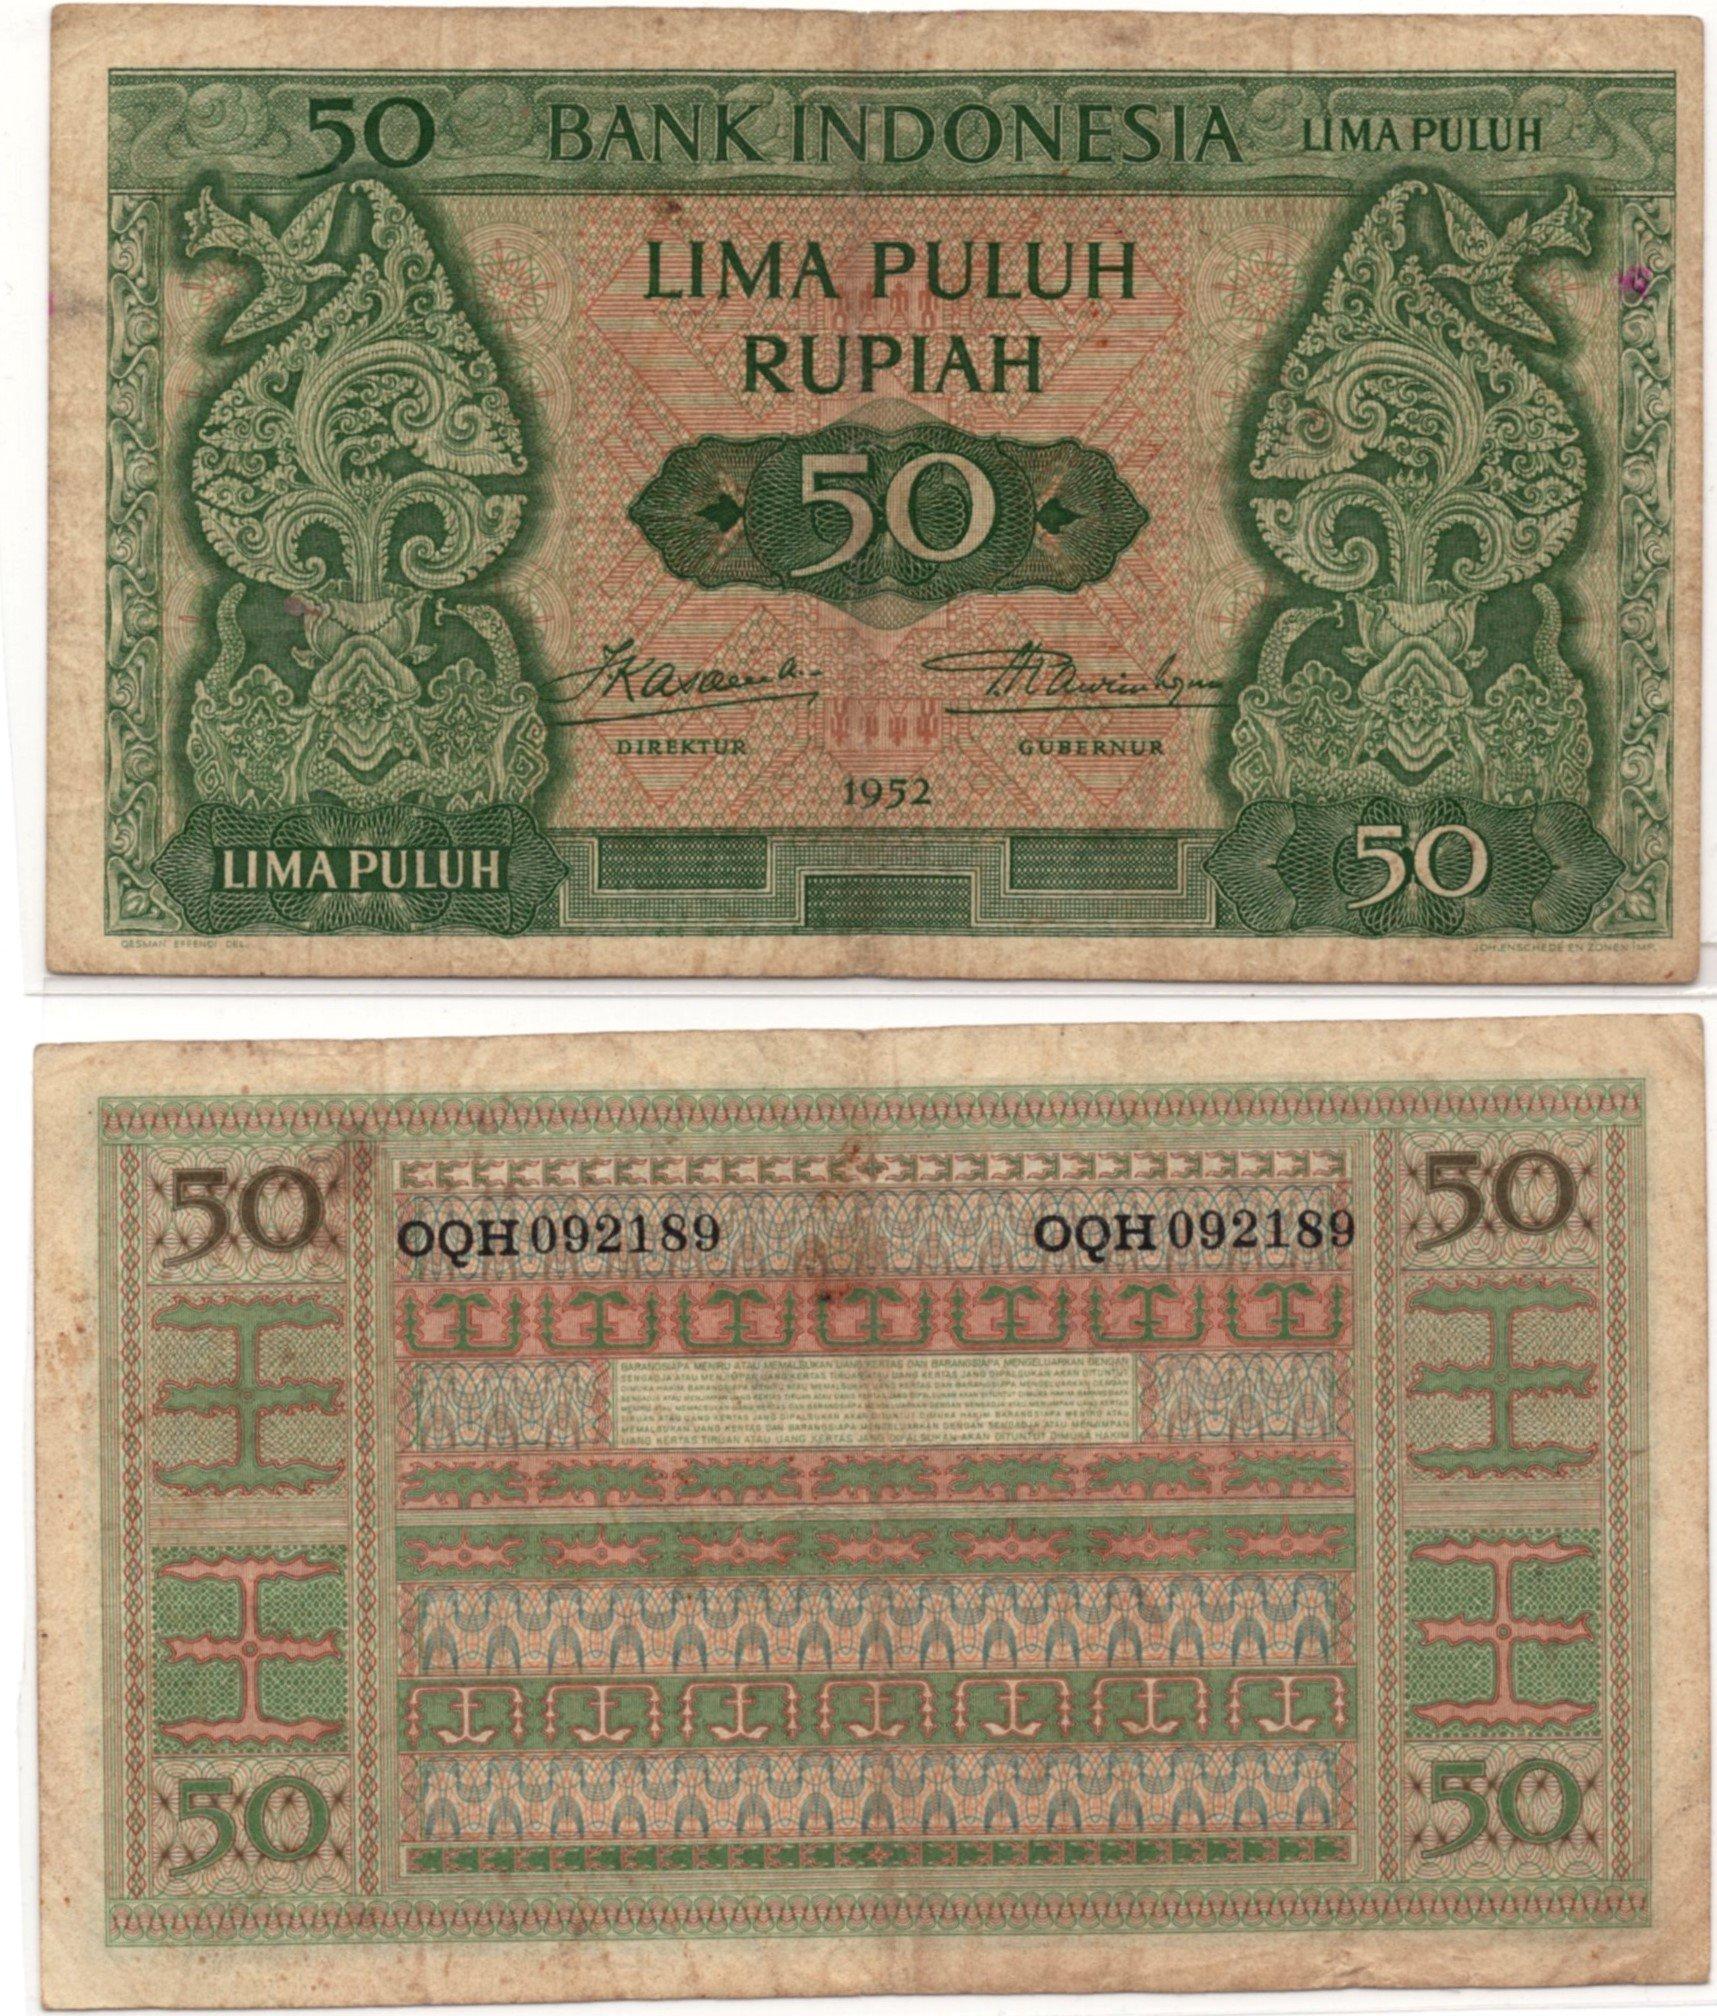 indonesia 50 rupiah 1952